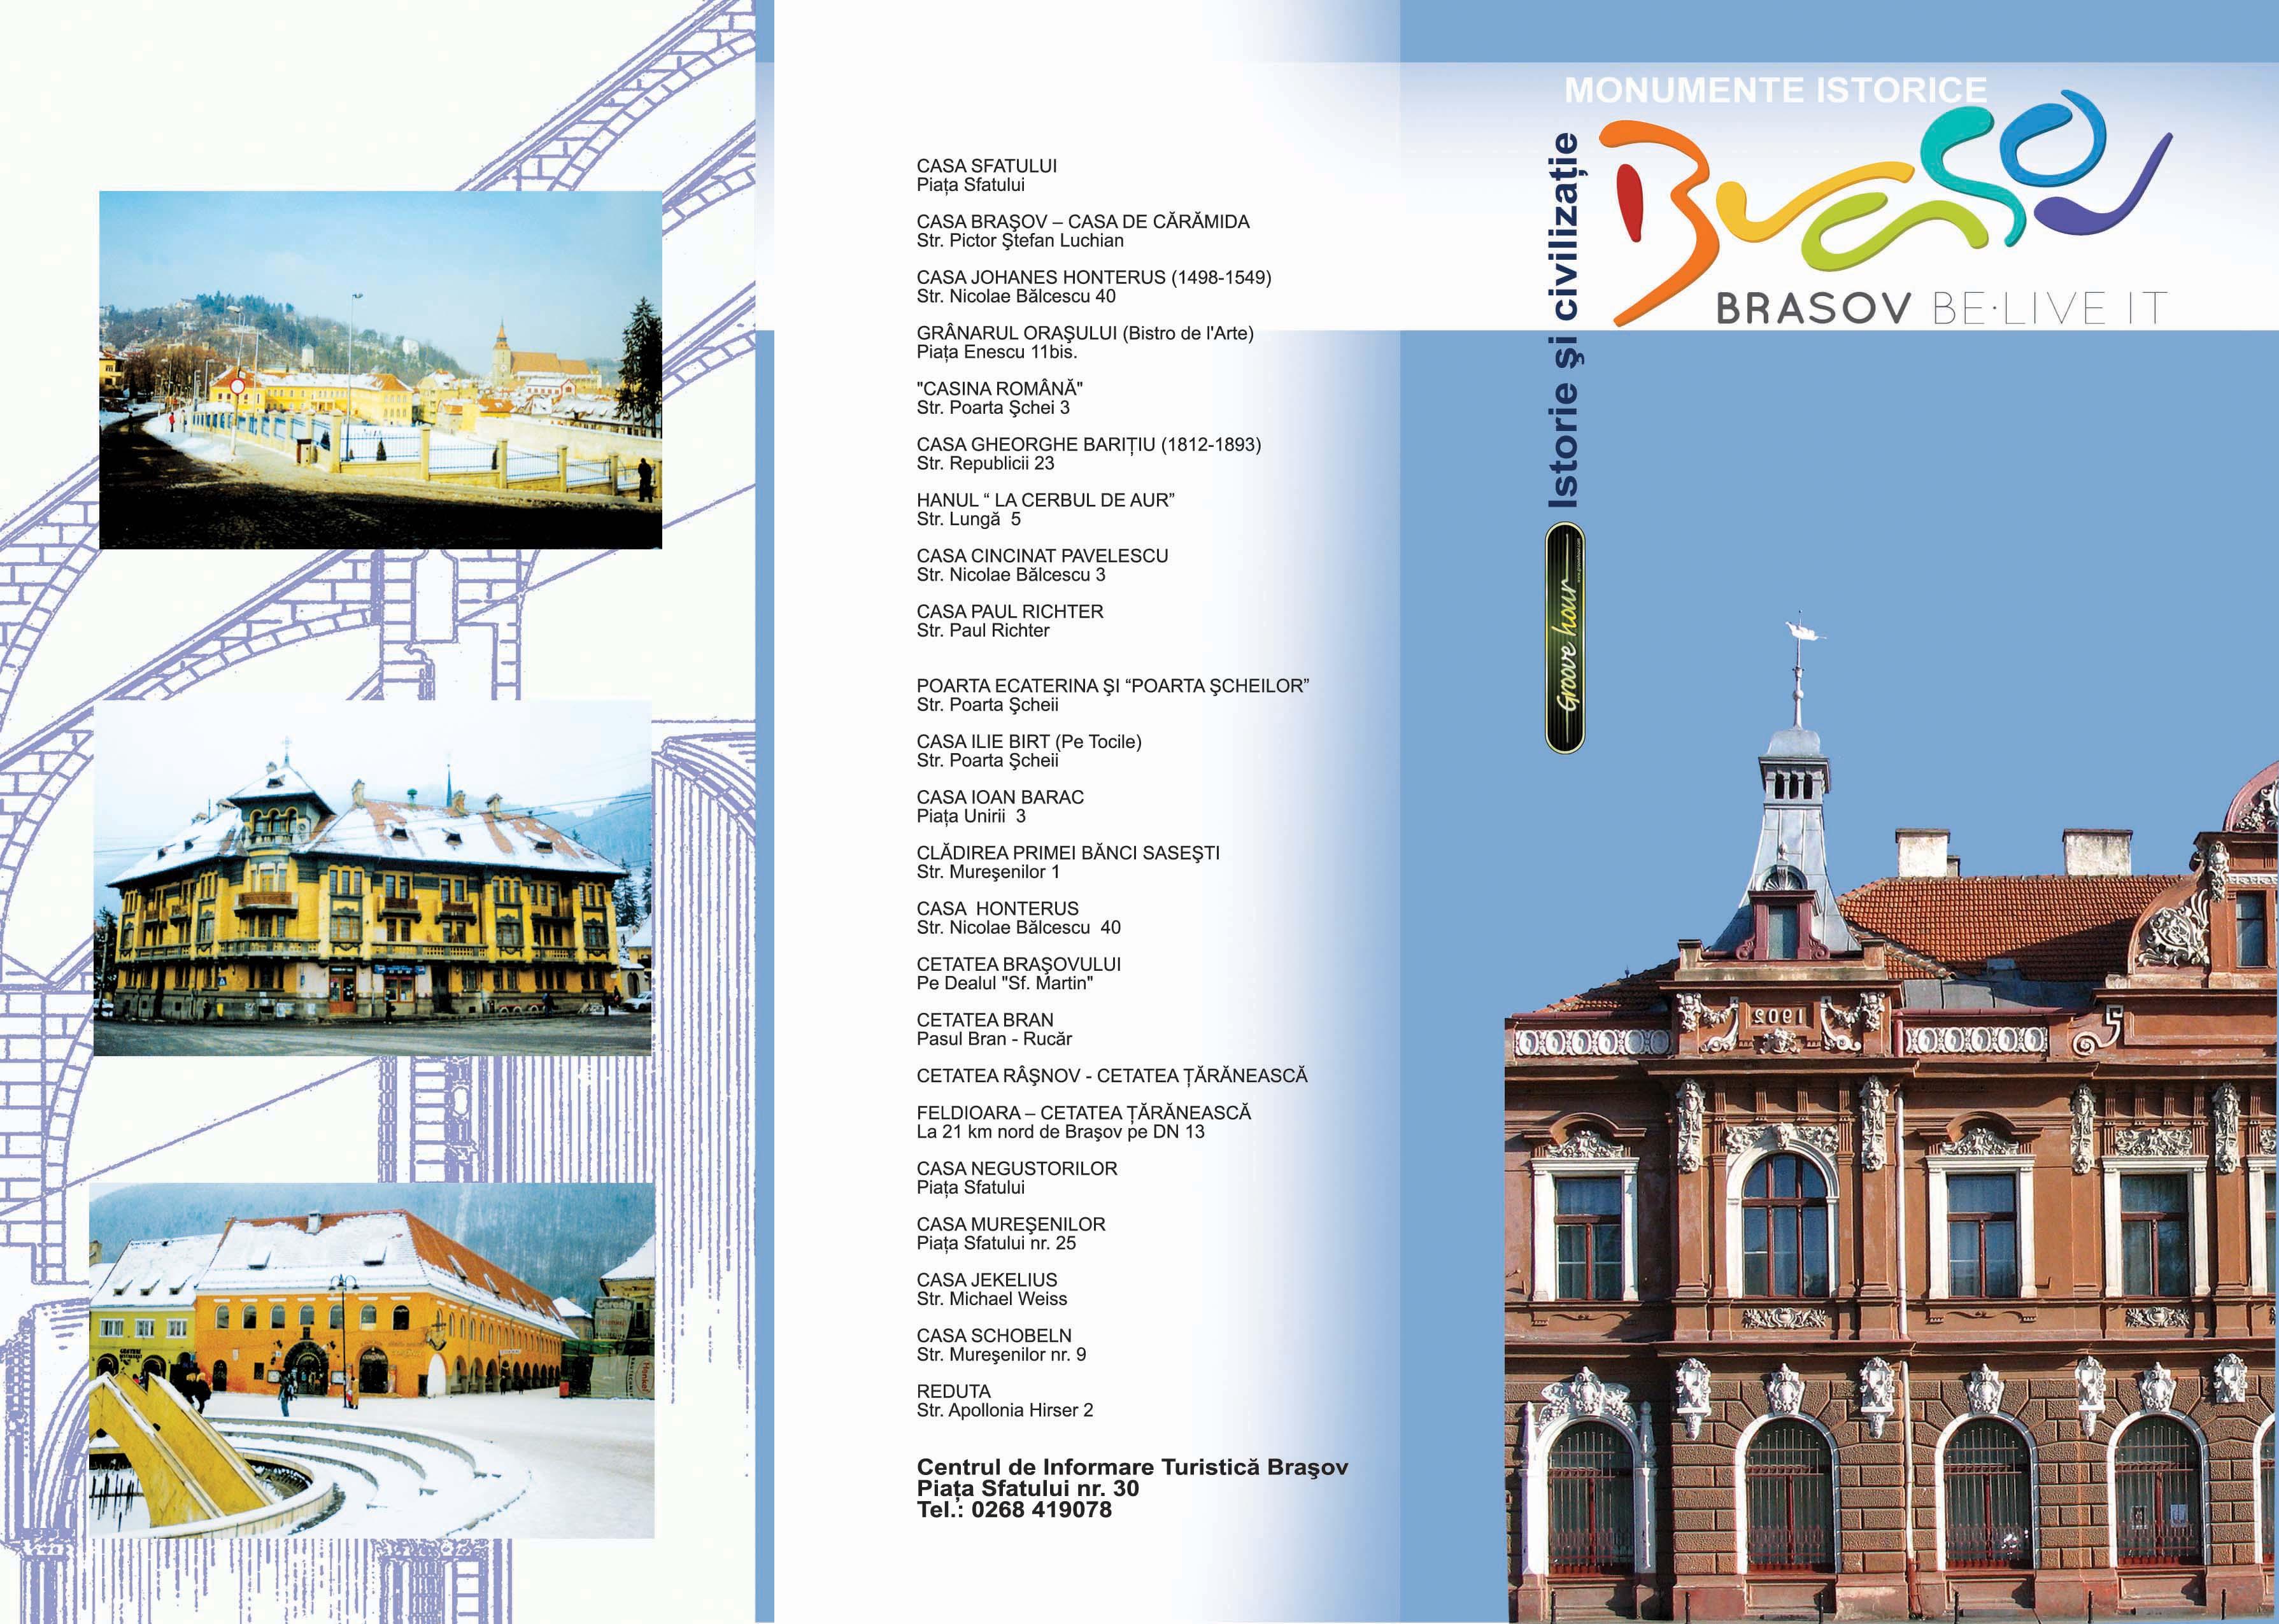 Monumente Istorice Brasov